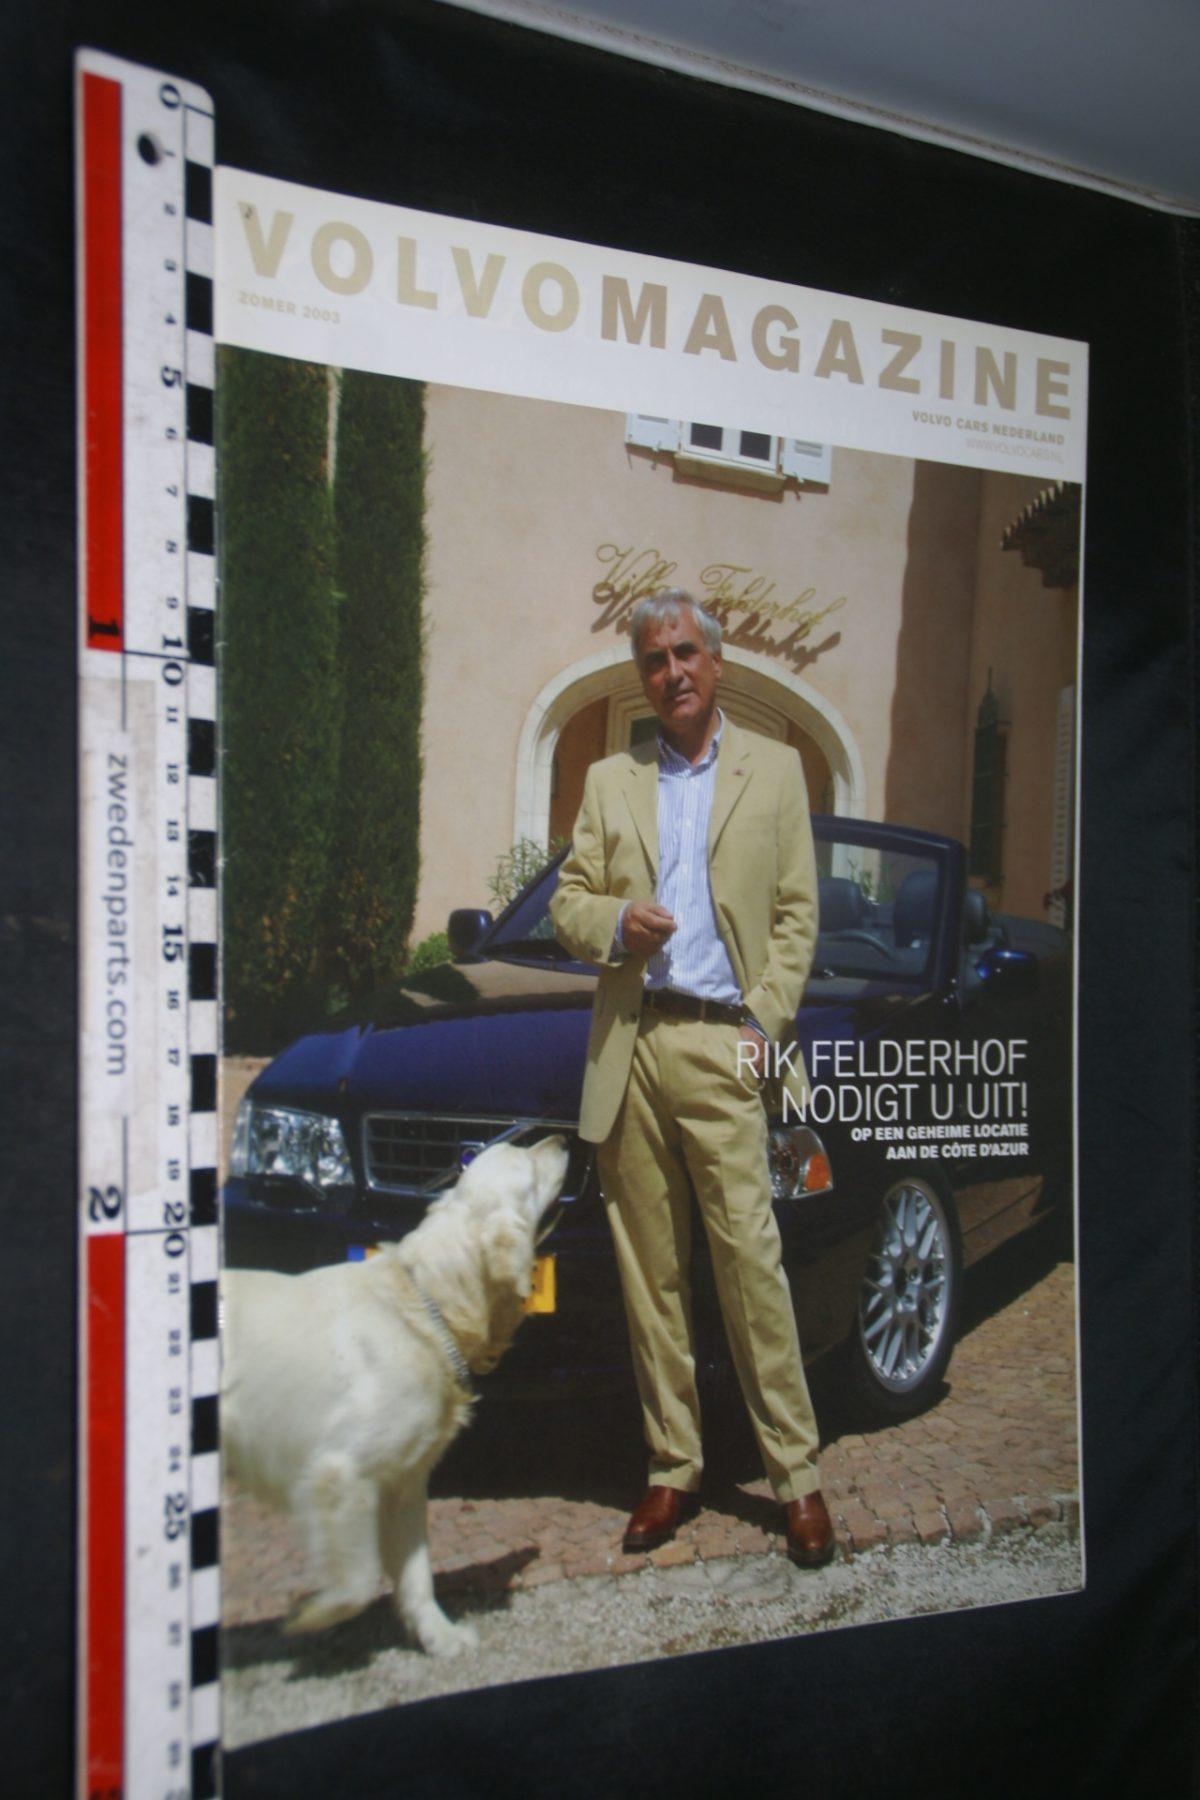 DSC04198 2003 zomer tijdschrift Volvomagazine Rik Felderhof